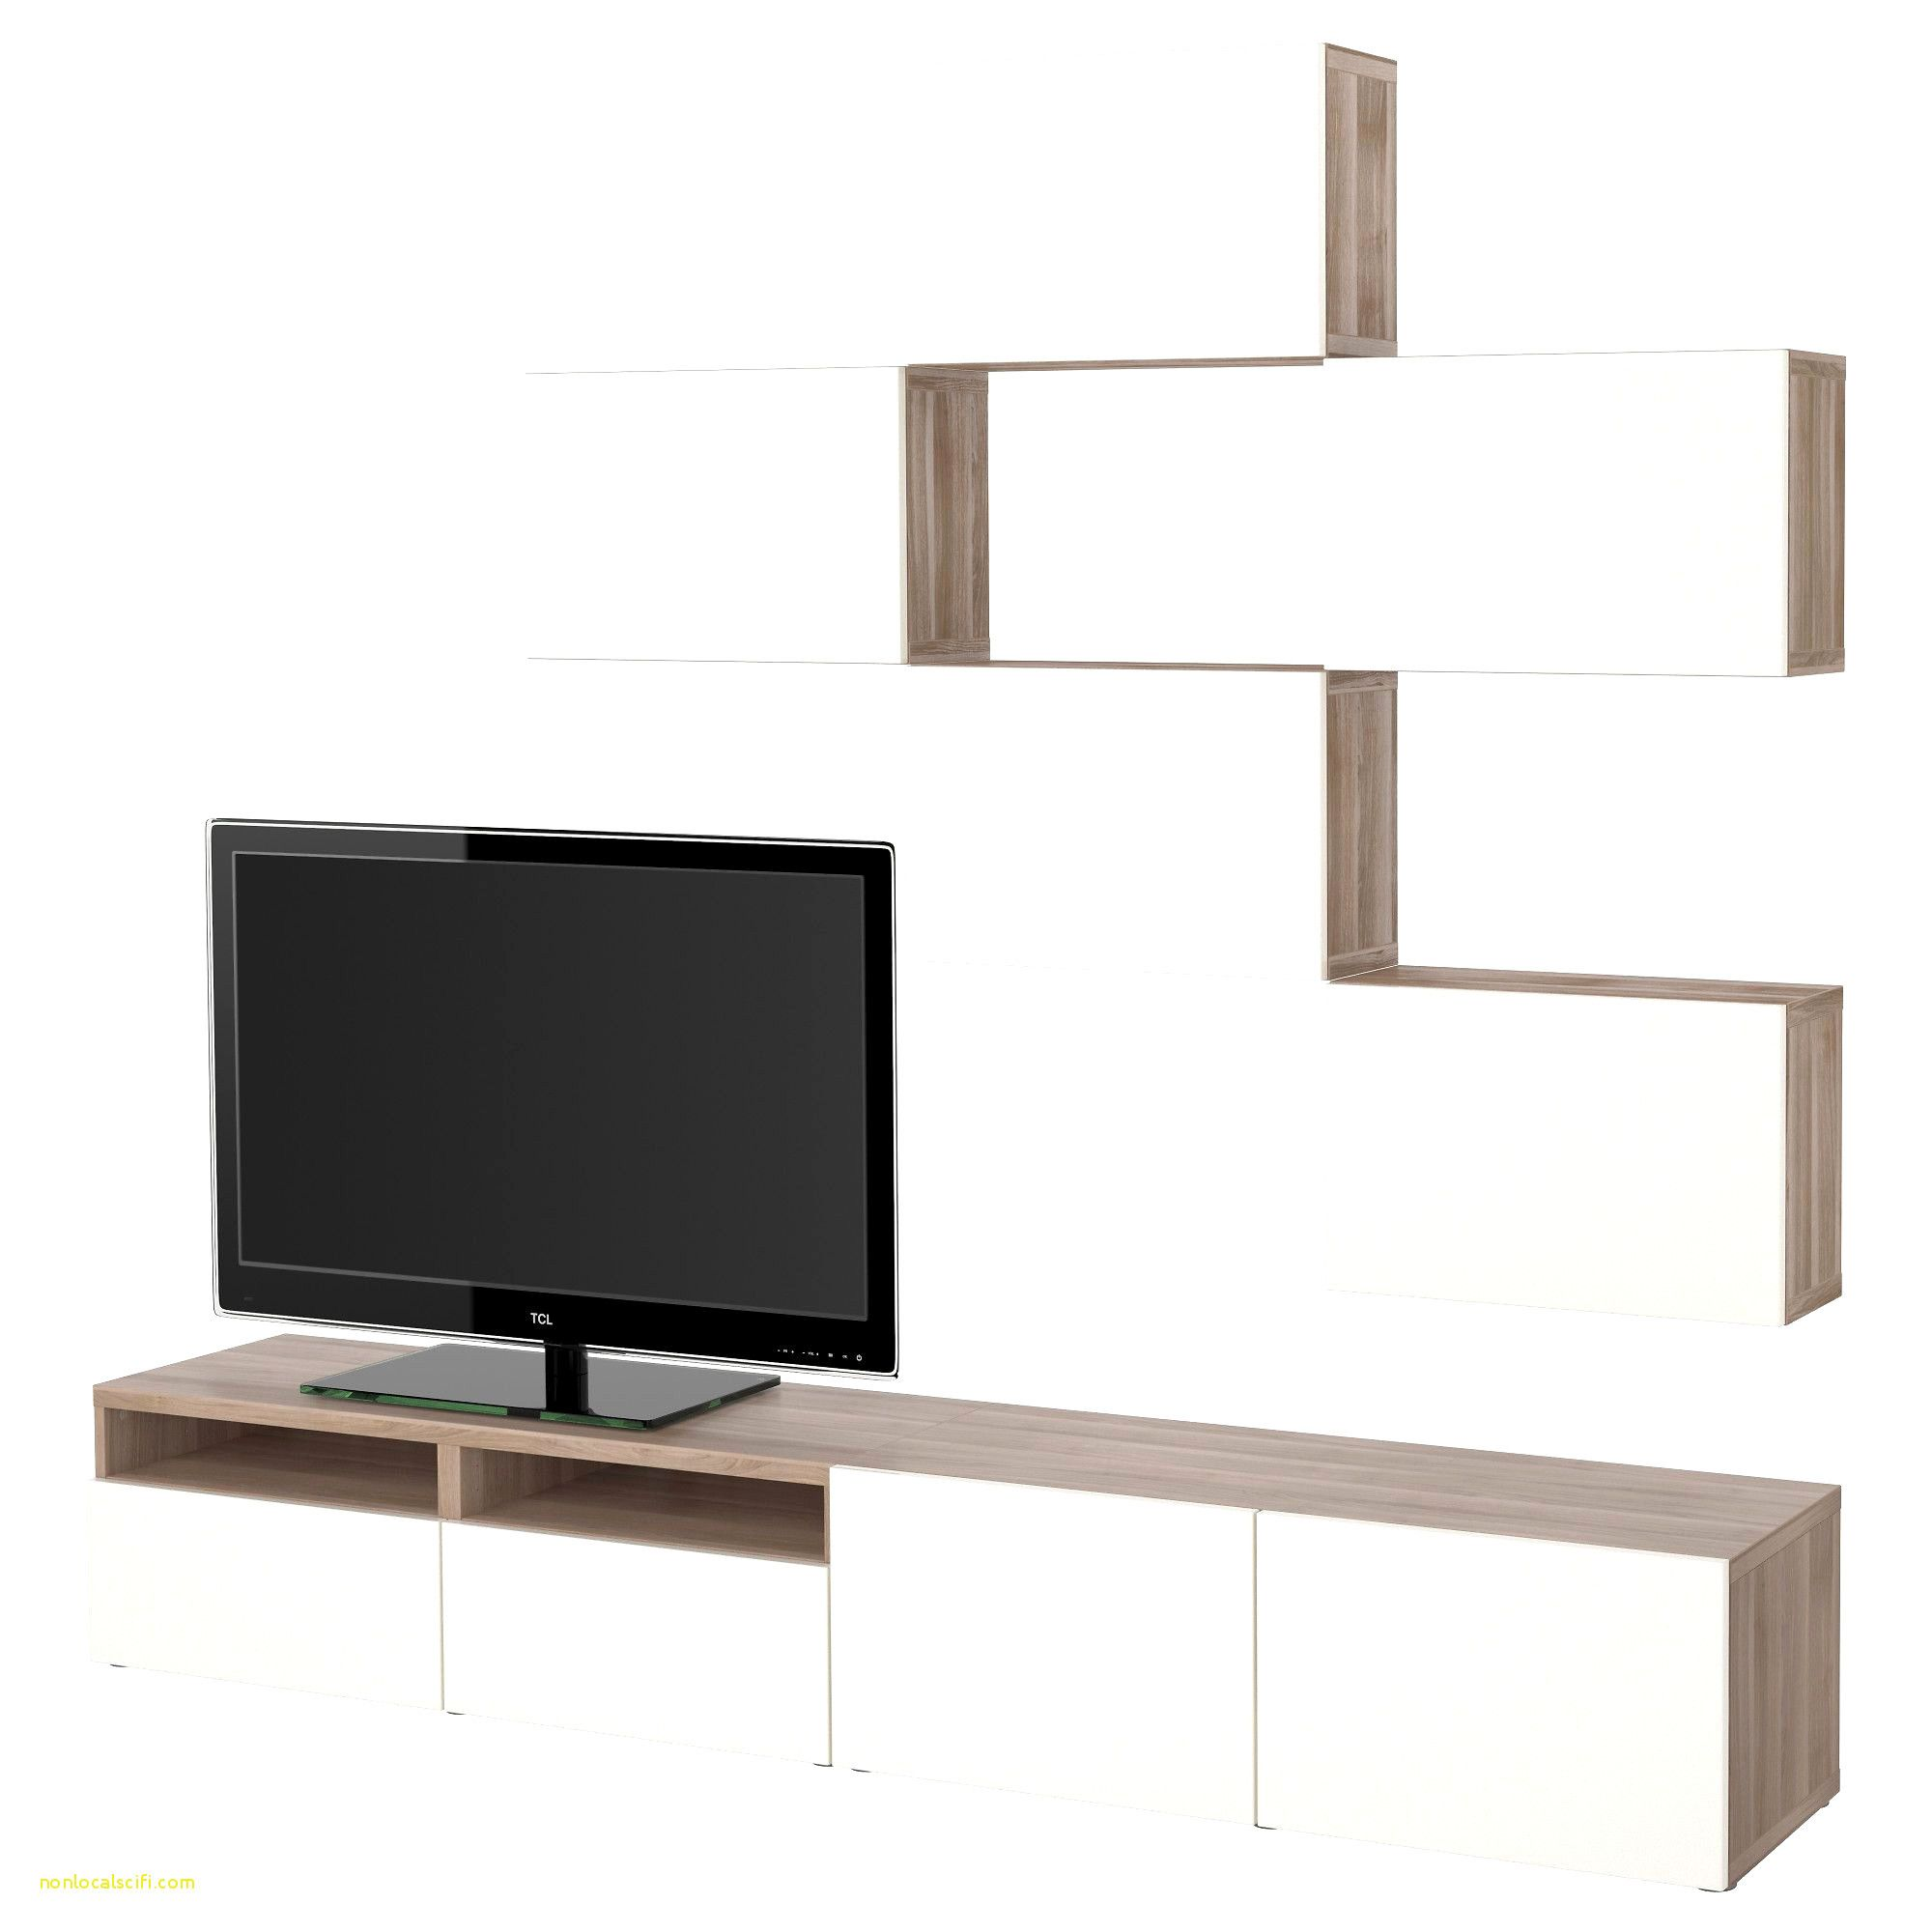 Armoire Metallique Pour Garage Armoire Metallique Pour Garage Hangar Metallique Pour Merce Batiment Metallique Tv Cabinet Ikea Tv Storage Tv Stand Furniture